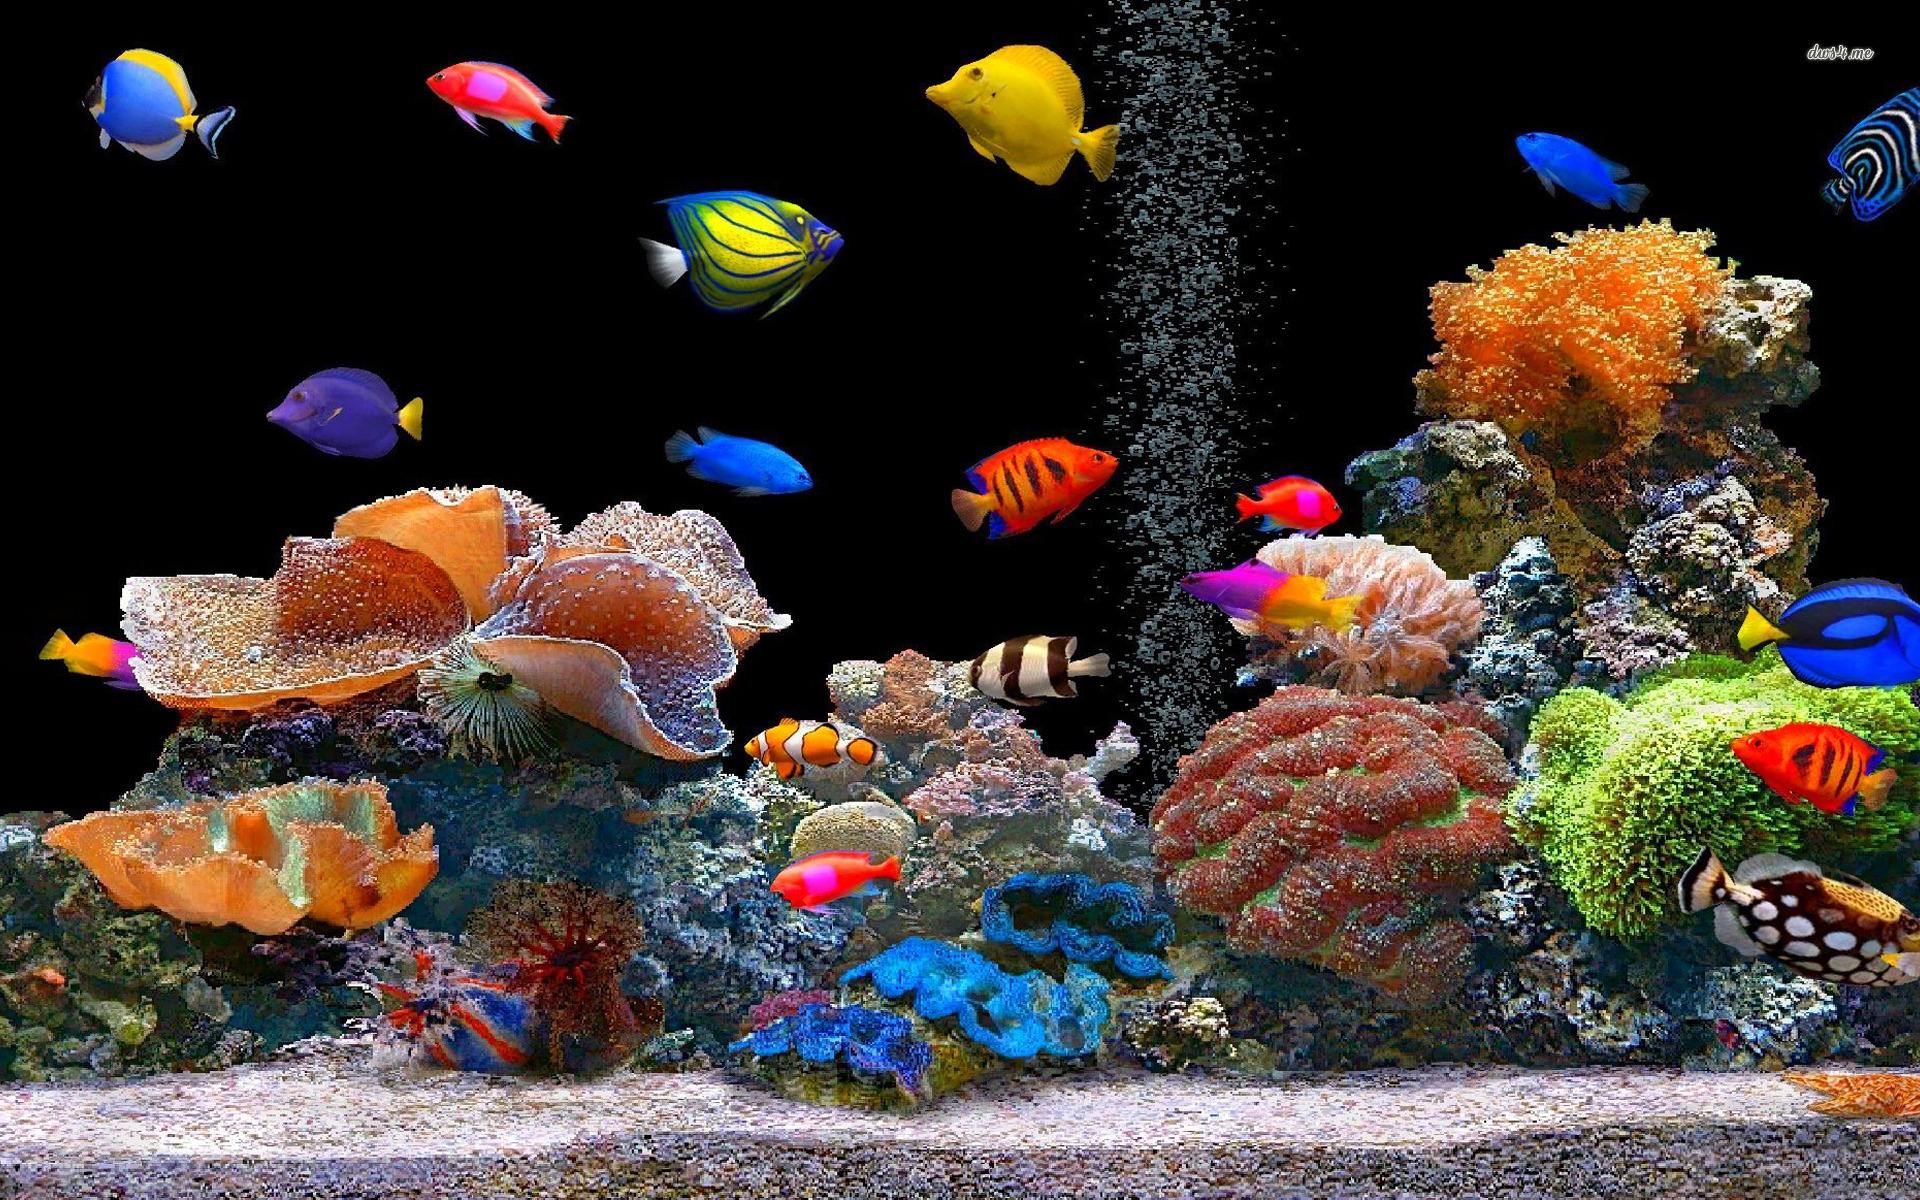 fish marlin desktop 1920x1200 - photo #36